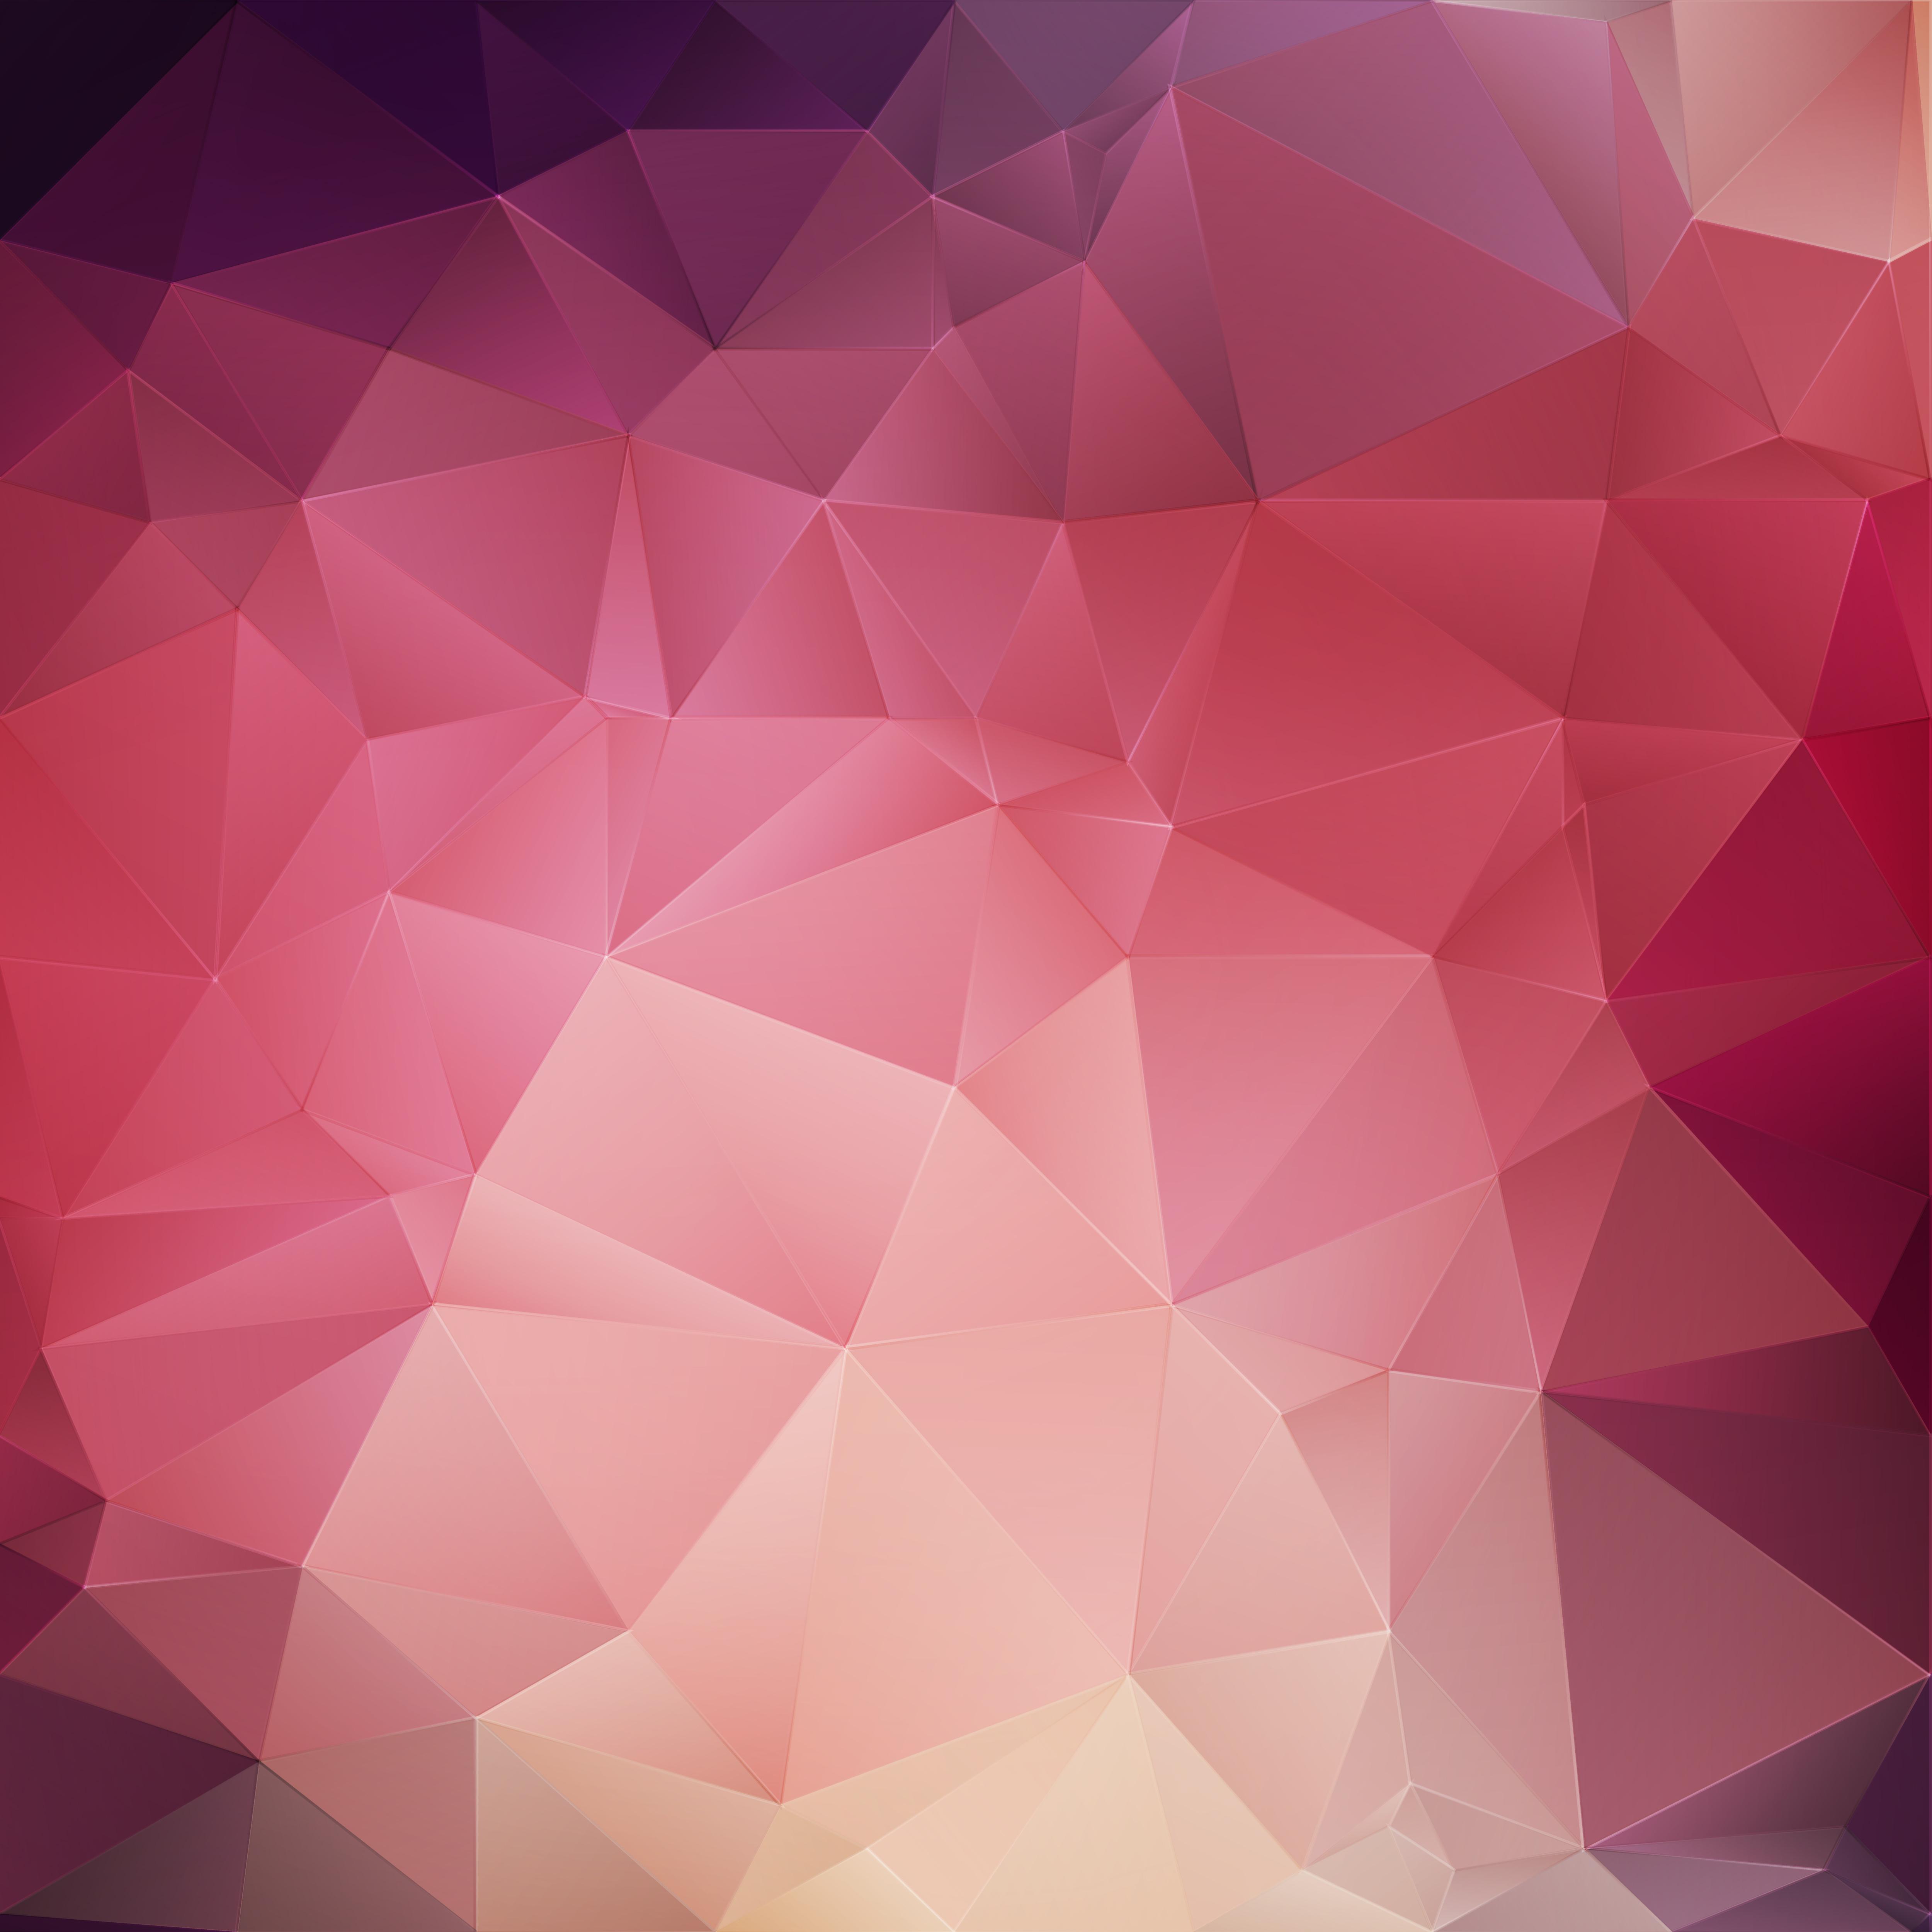 pink crystal geometric background